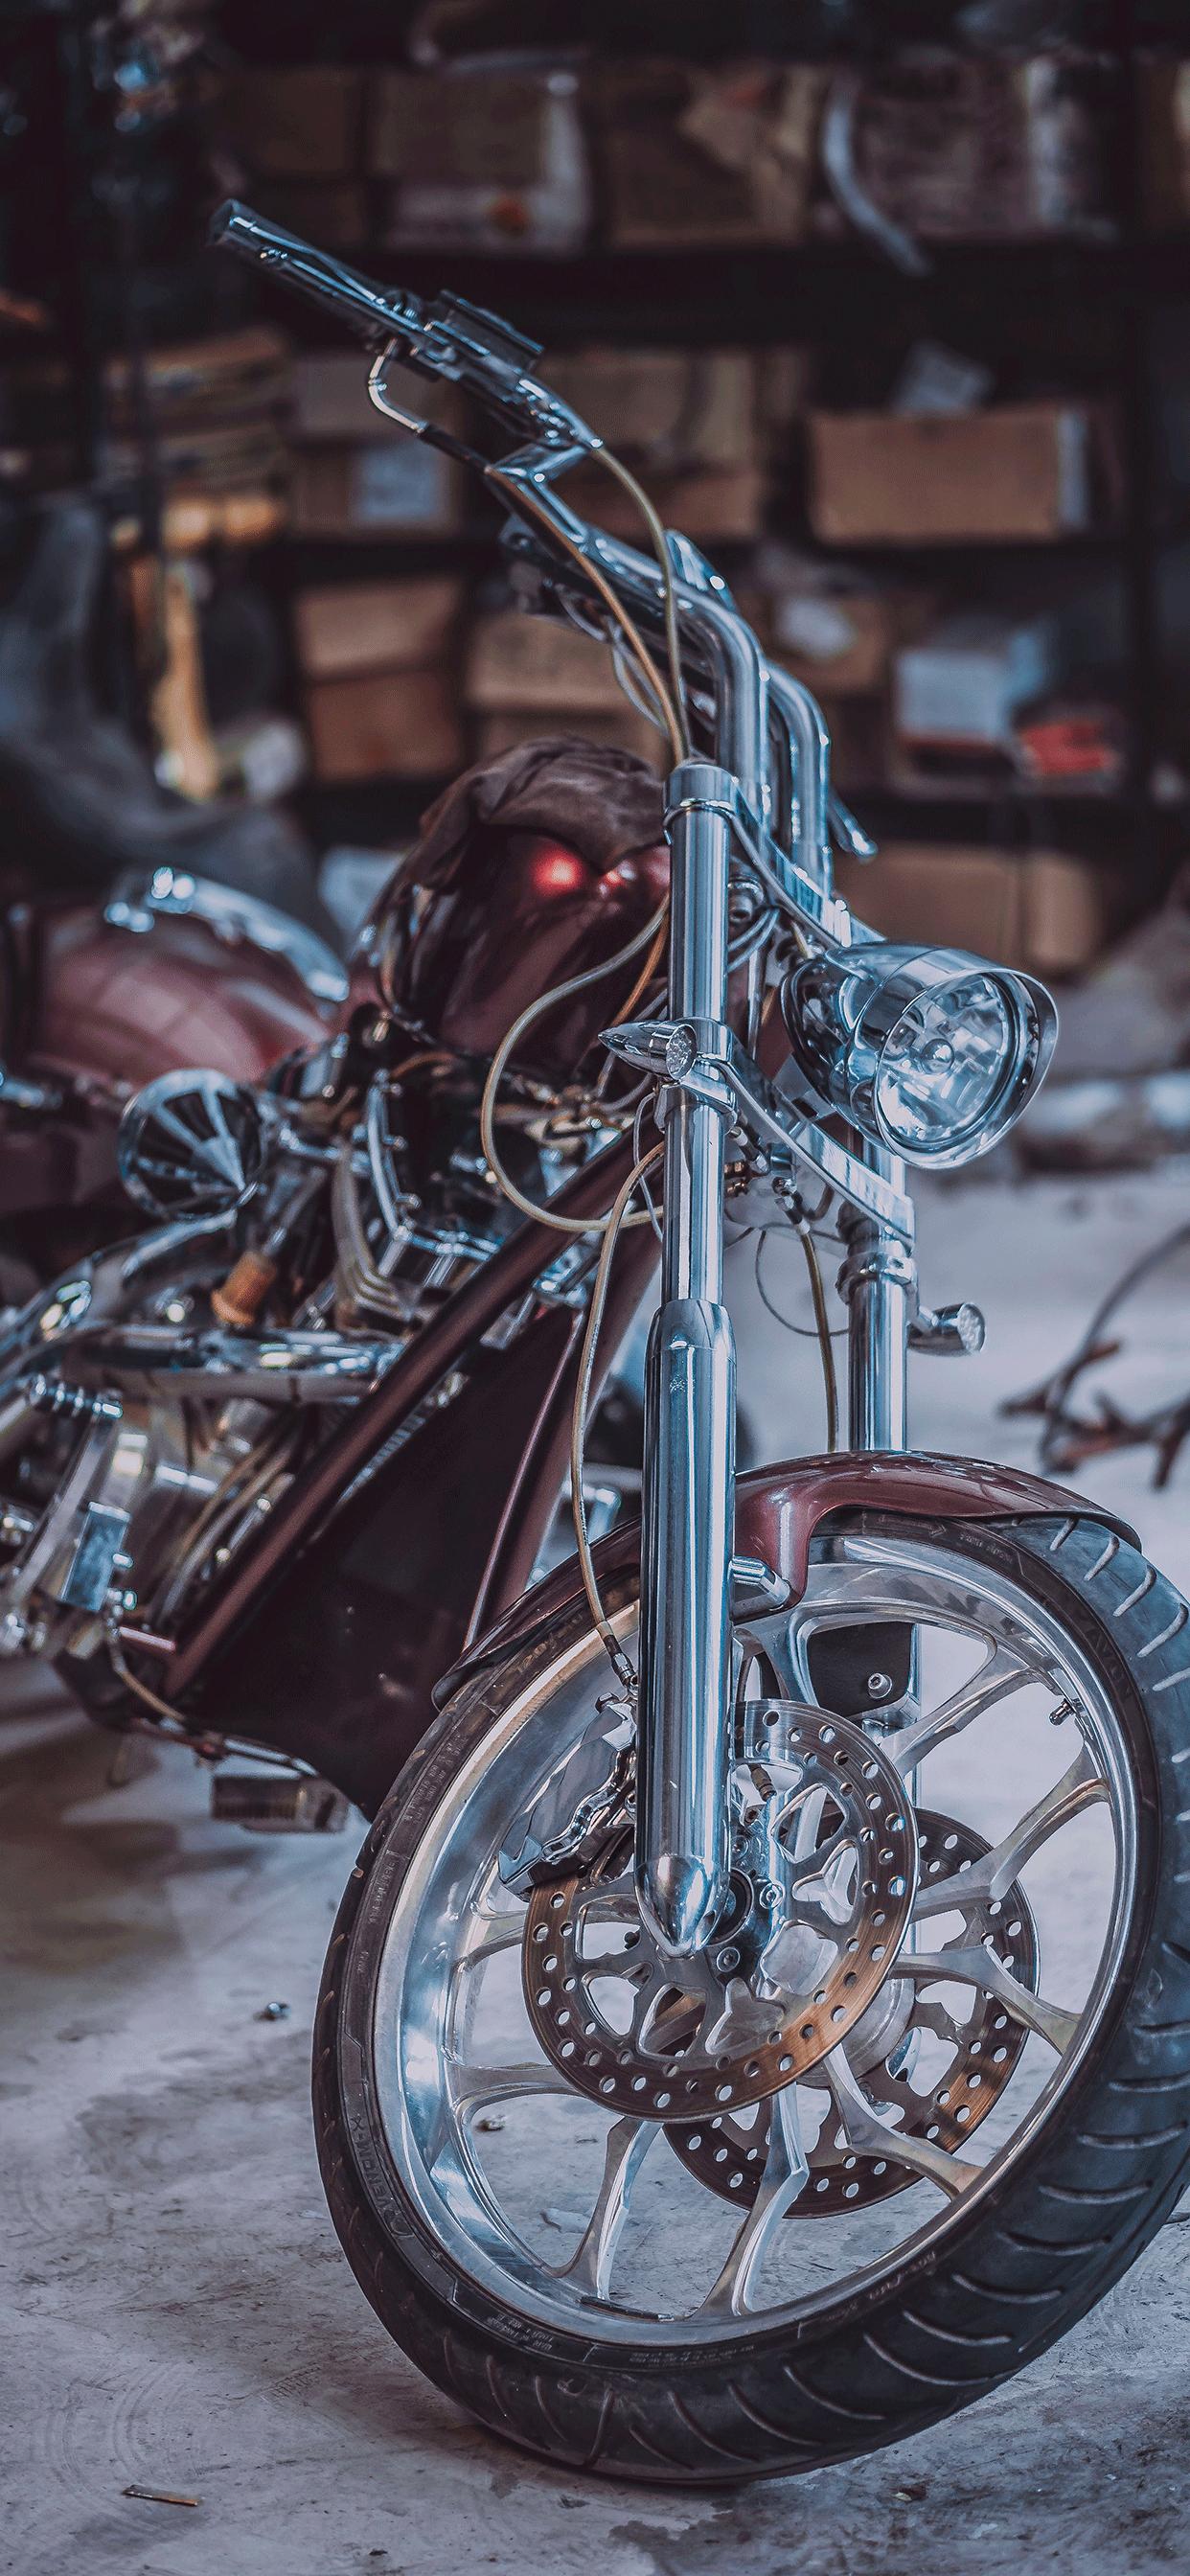 iPhone wallpaper harley davidson purple Harley Davidson